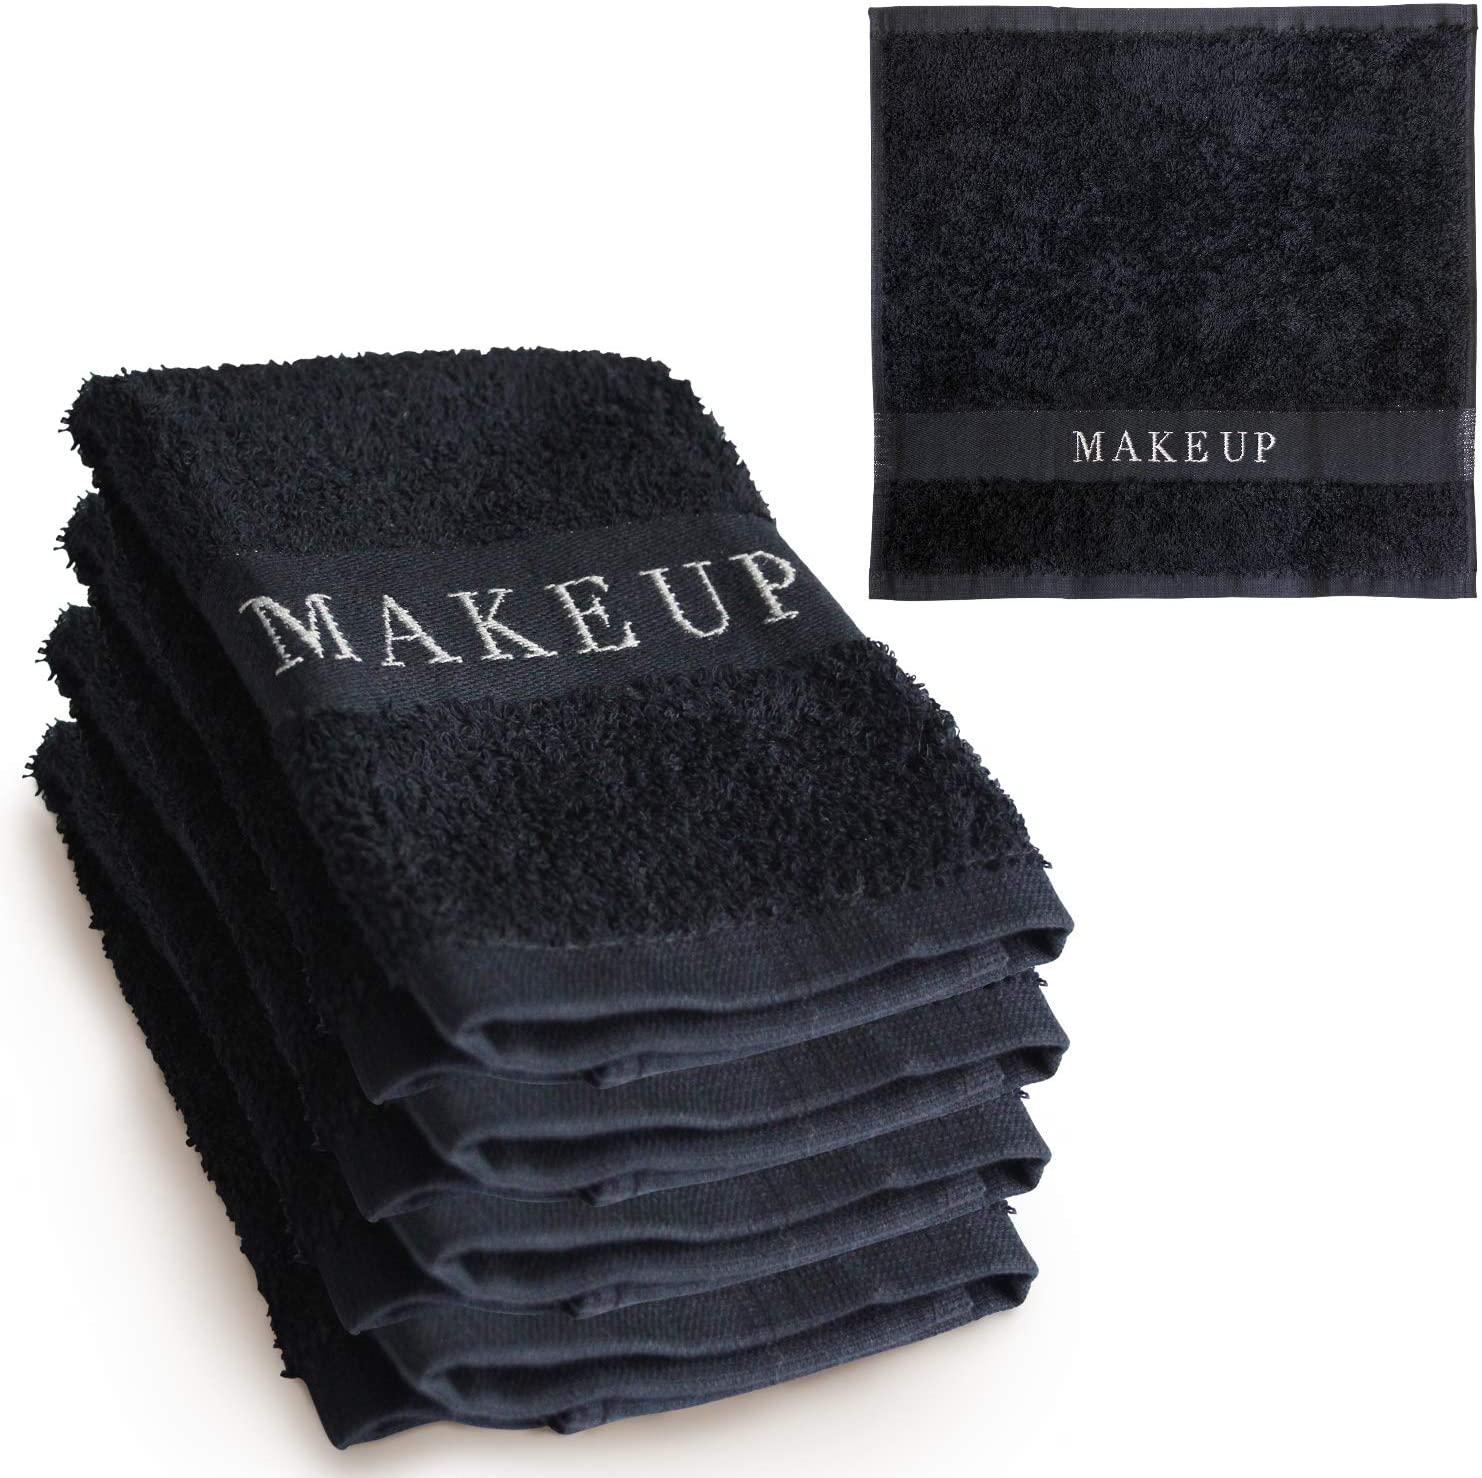 The Little Black Towel Makeup Remover Cloth - Luxury Washcloths for Gentle Face Wash, Removing Eye Liner, Mascara, plus Foundation Eraser. Bleach Resistant, Soft Jacquard Lettering, Pack of 4